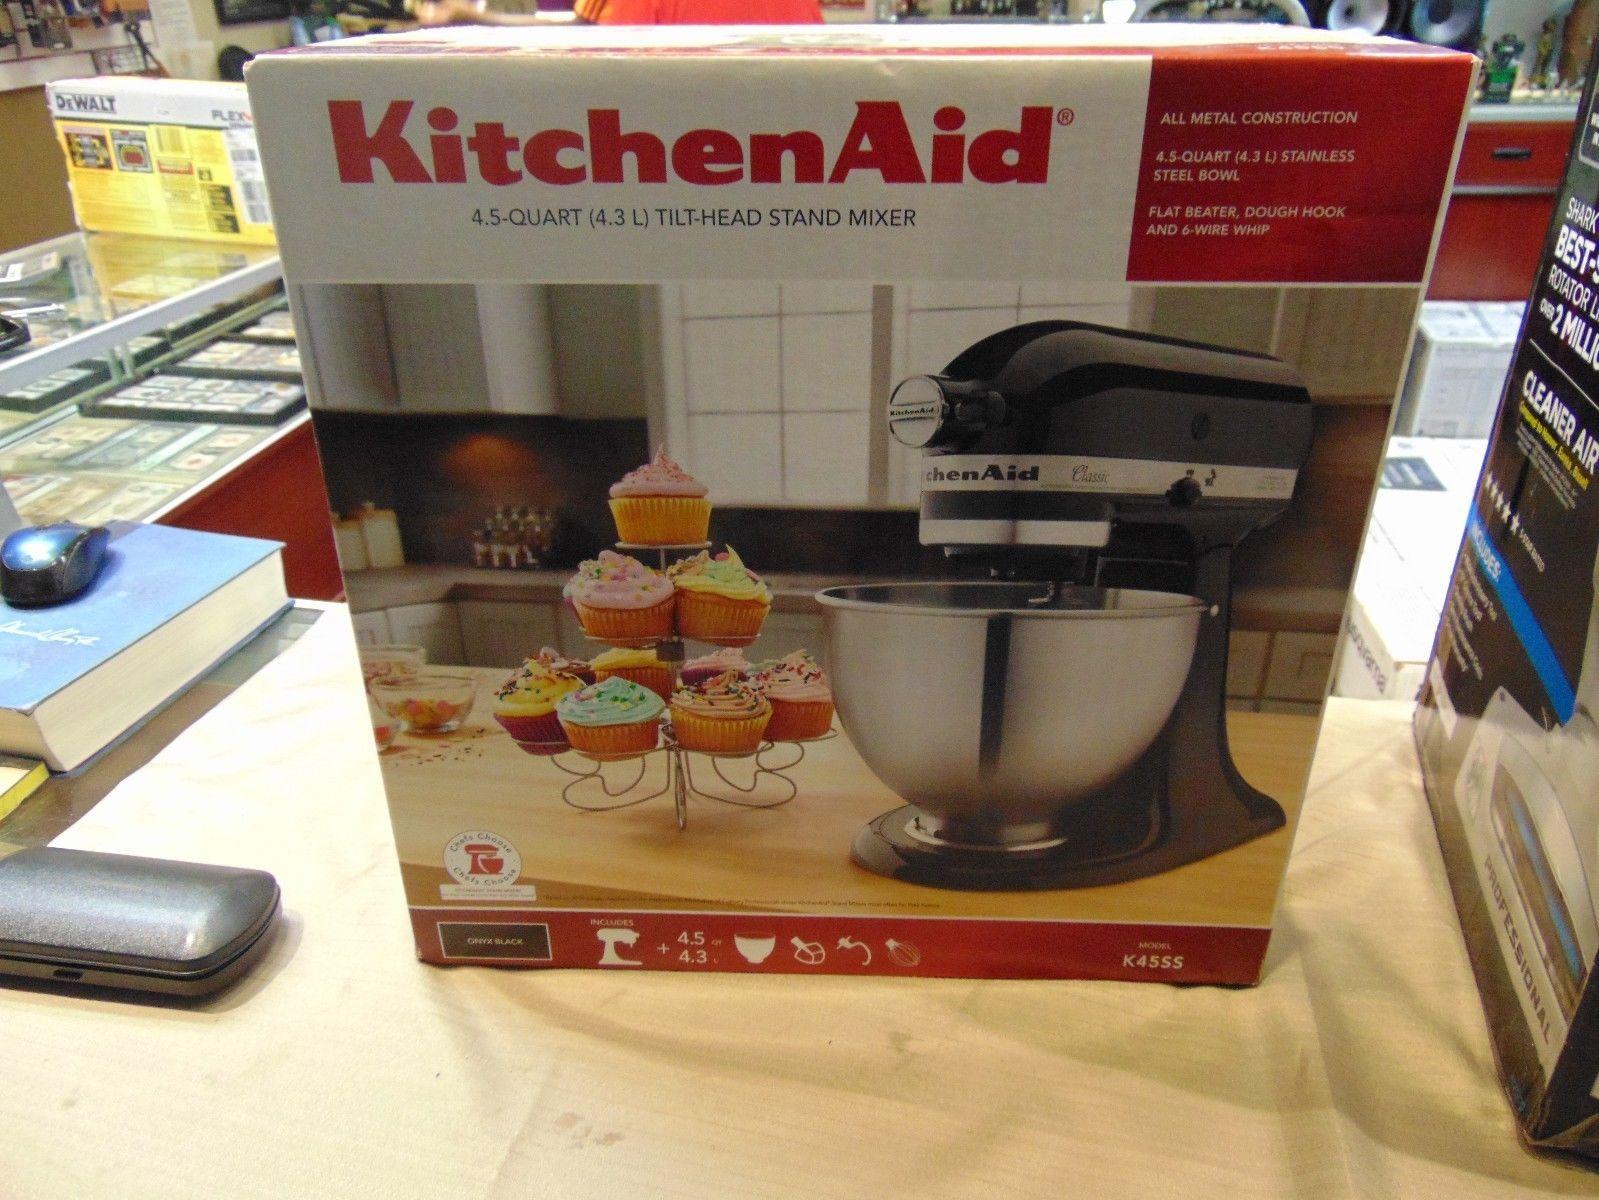 Countertop mixers 133701 kitchen aid mixer k45ss 275 watt